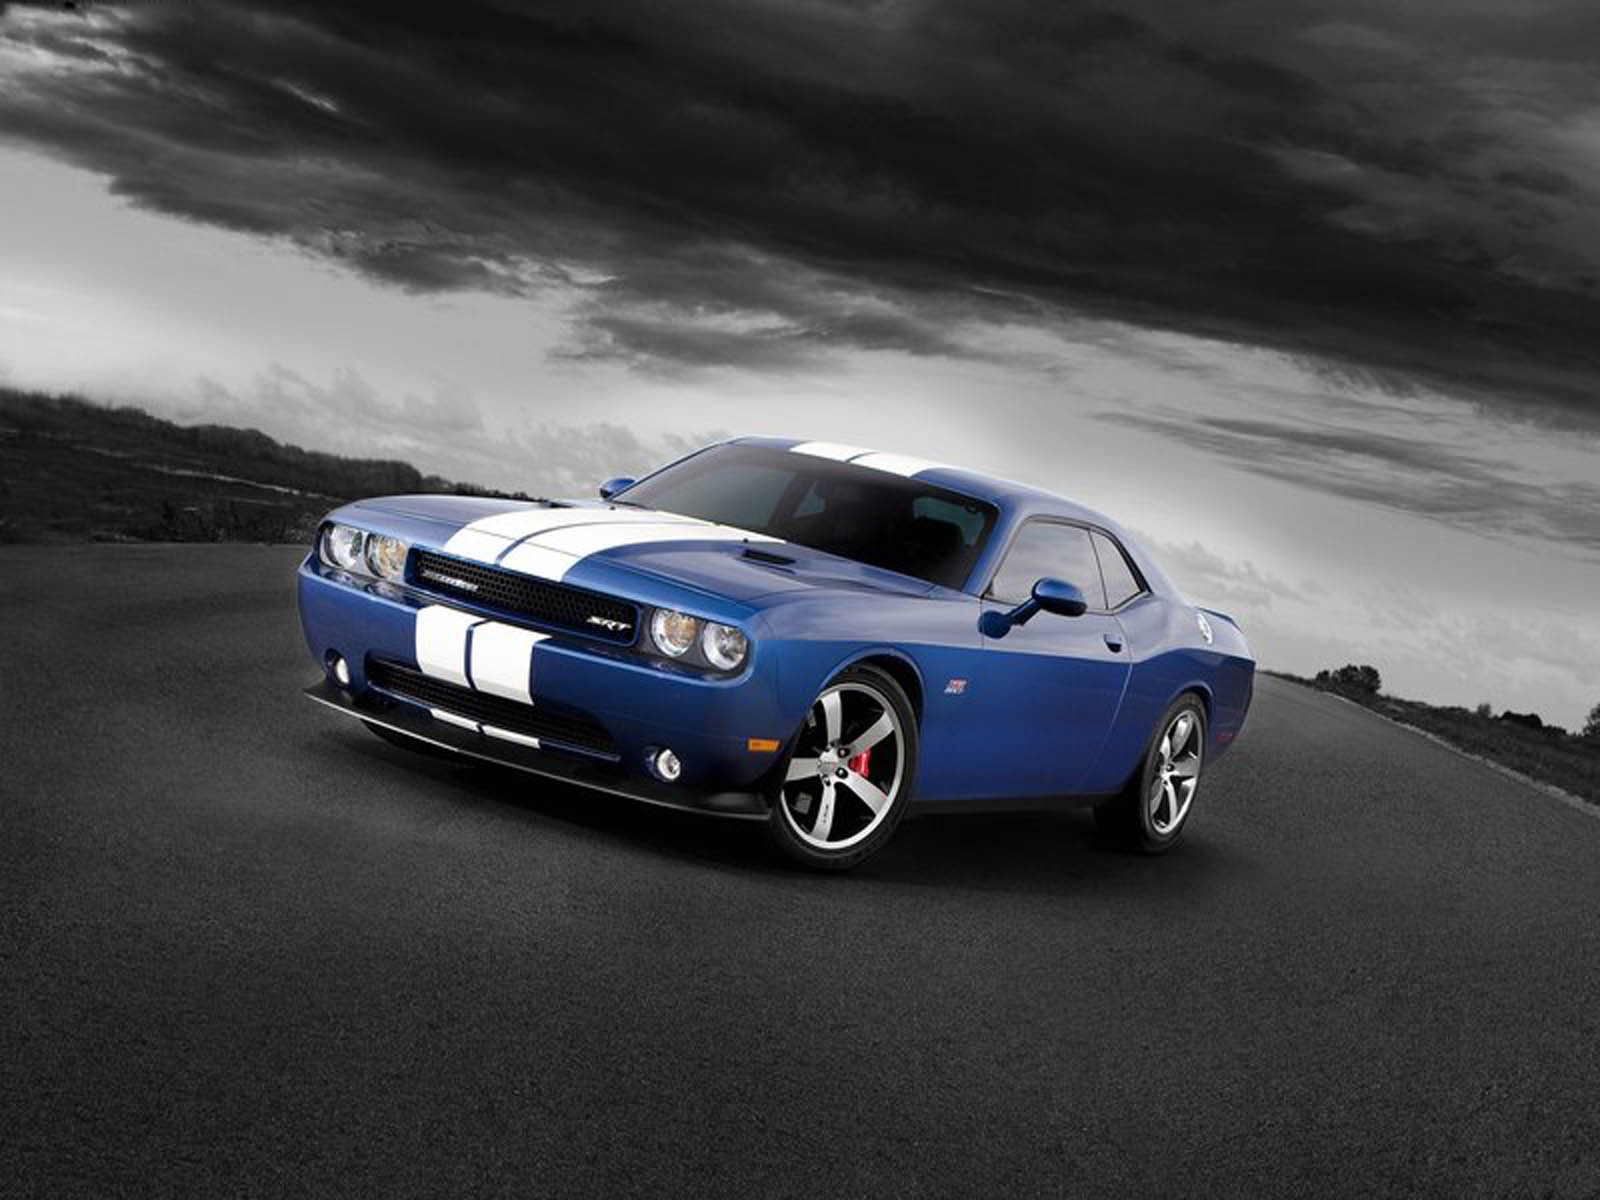 3d Wallpapers Download For Windows Xp Wallpaper Dodge Challenger Srt8 Car